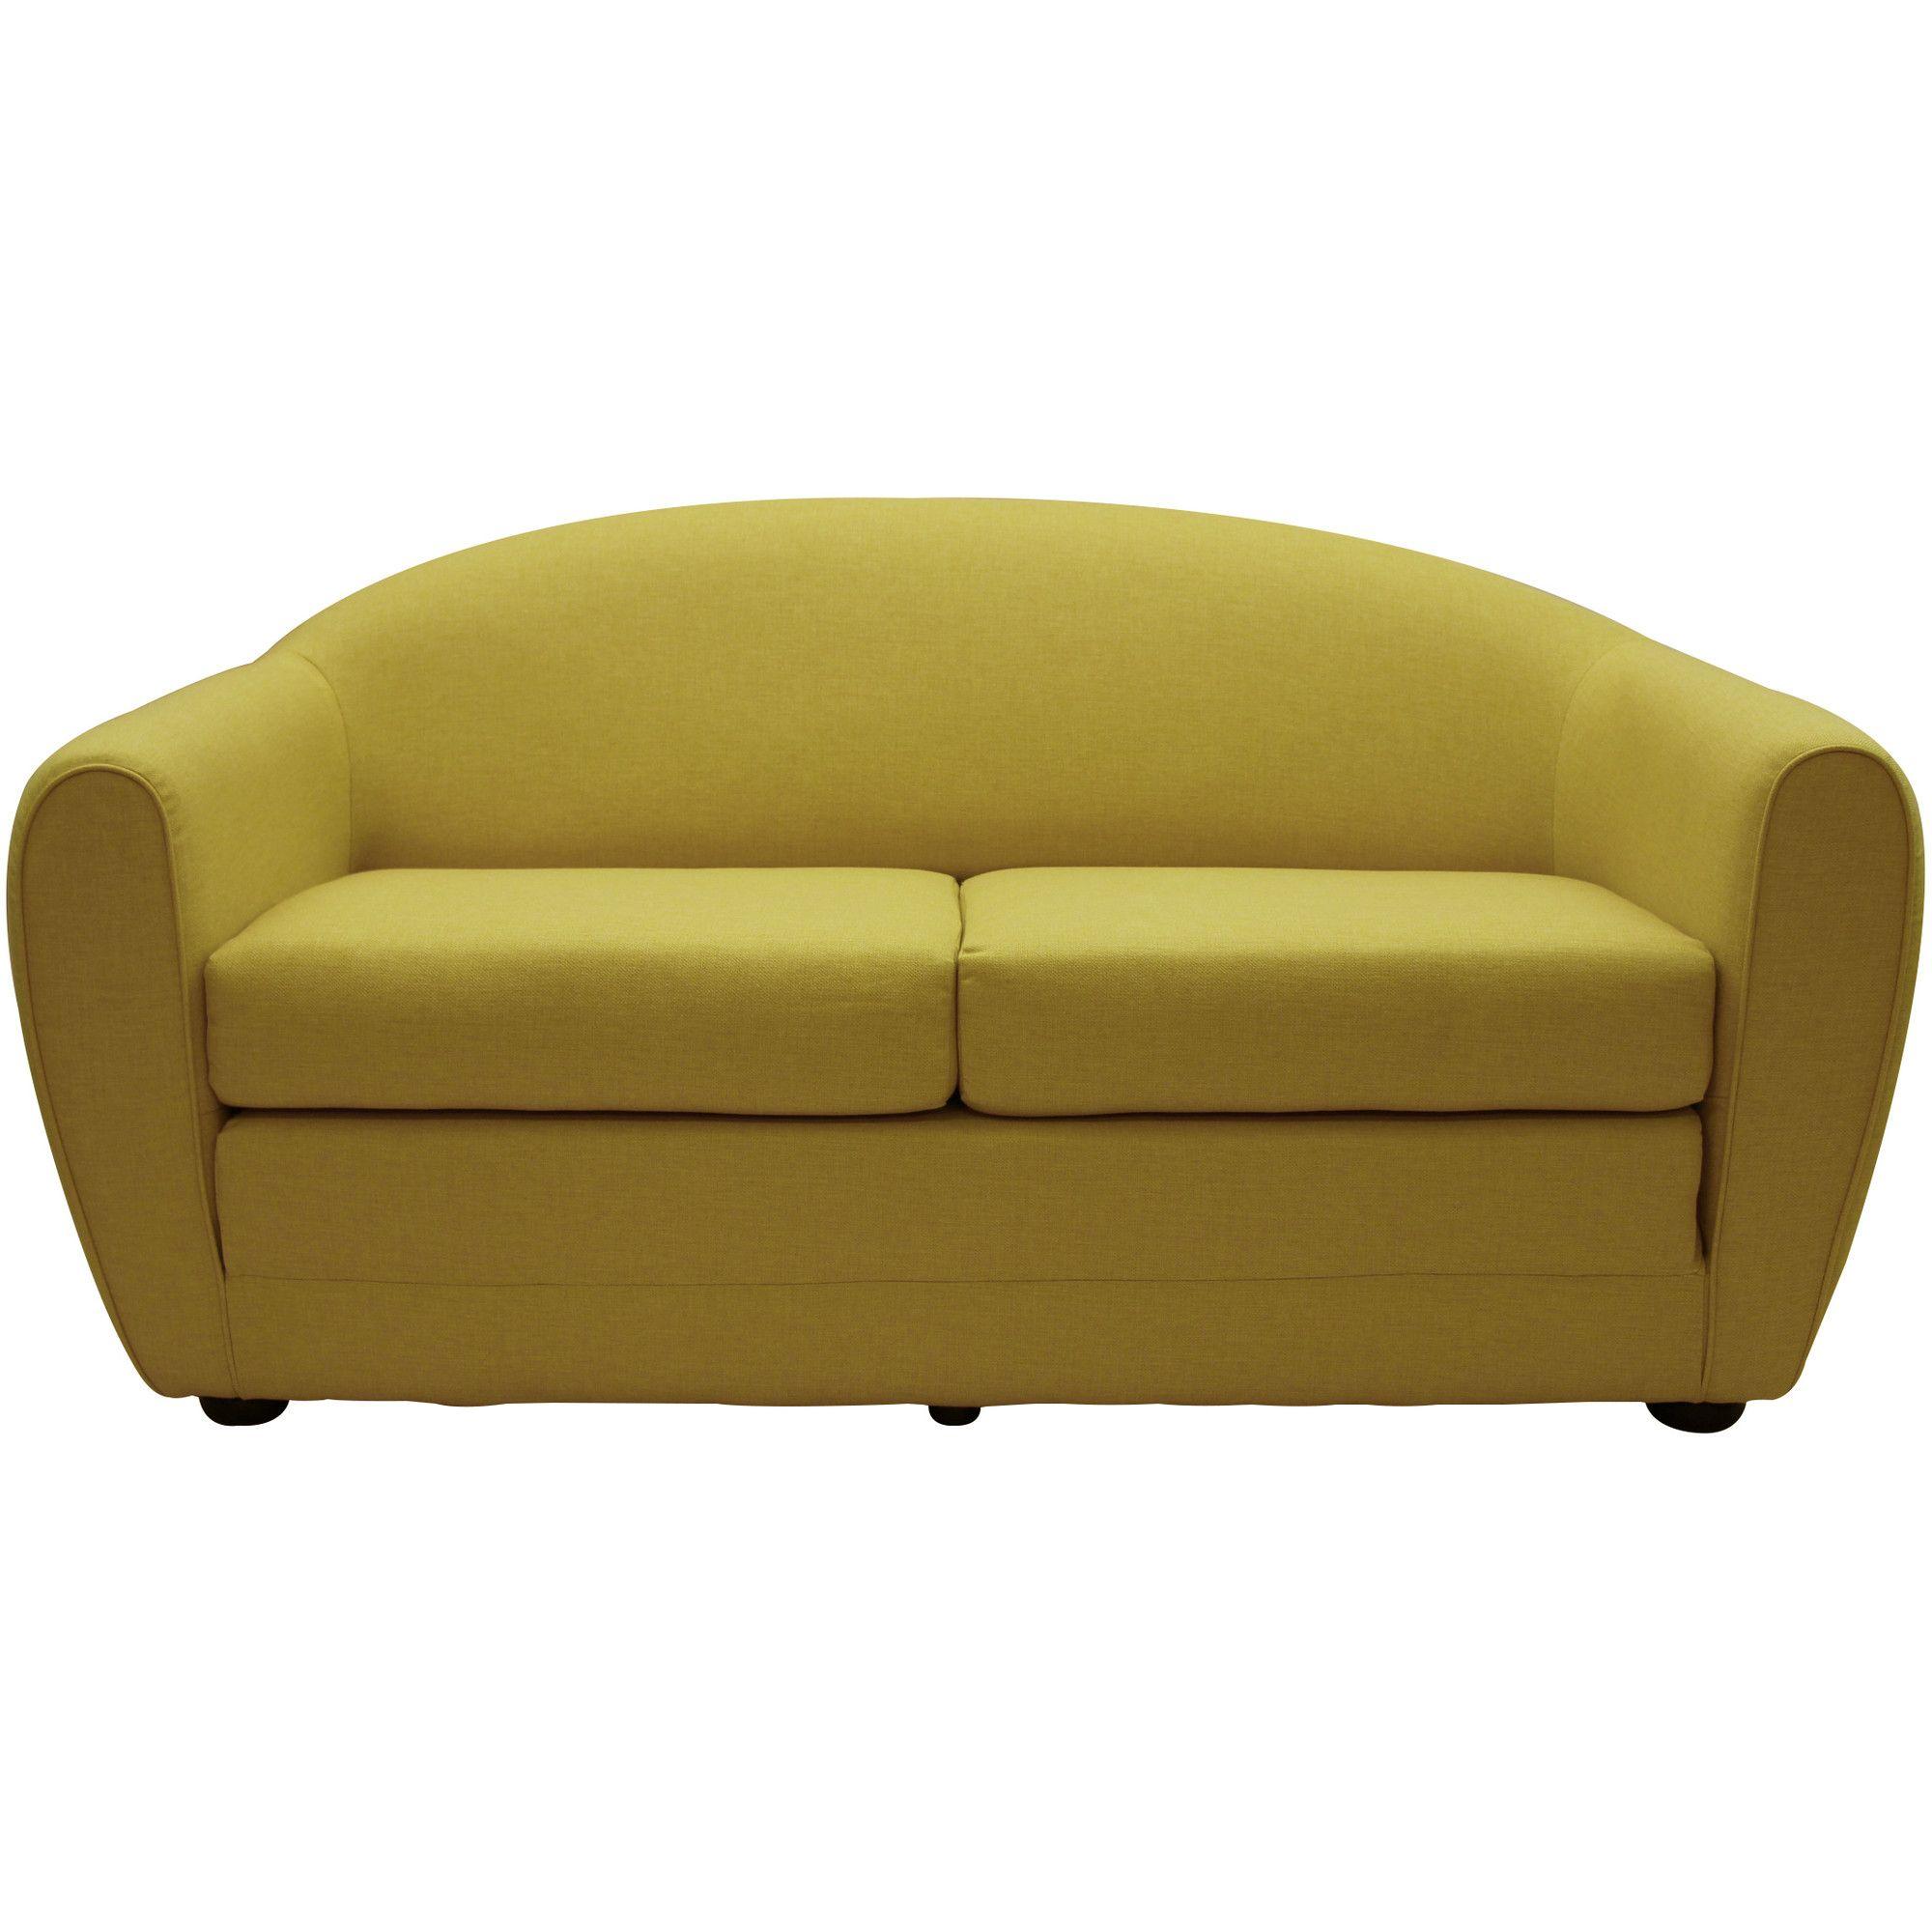 Superb Lotus Sleeper Sofa Products Sofa Sleeper Sofa Sofa Colors Andrewgaddart Wooden Chair Designs For Living Room Andrewgaddartcom